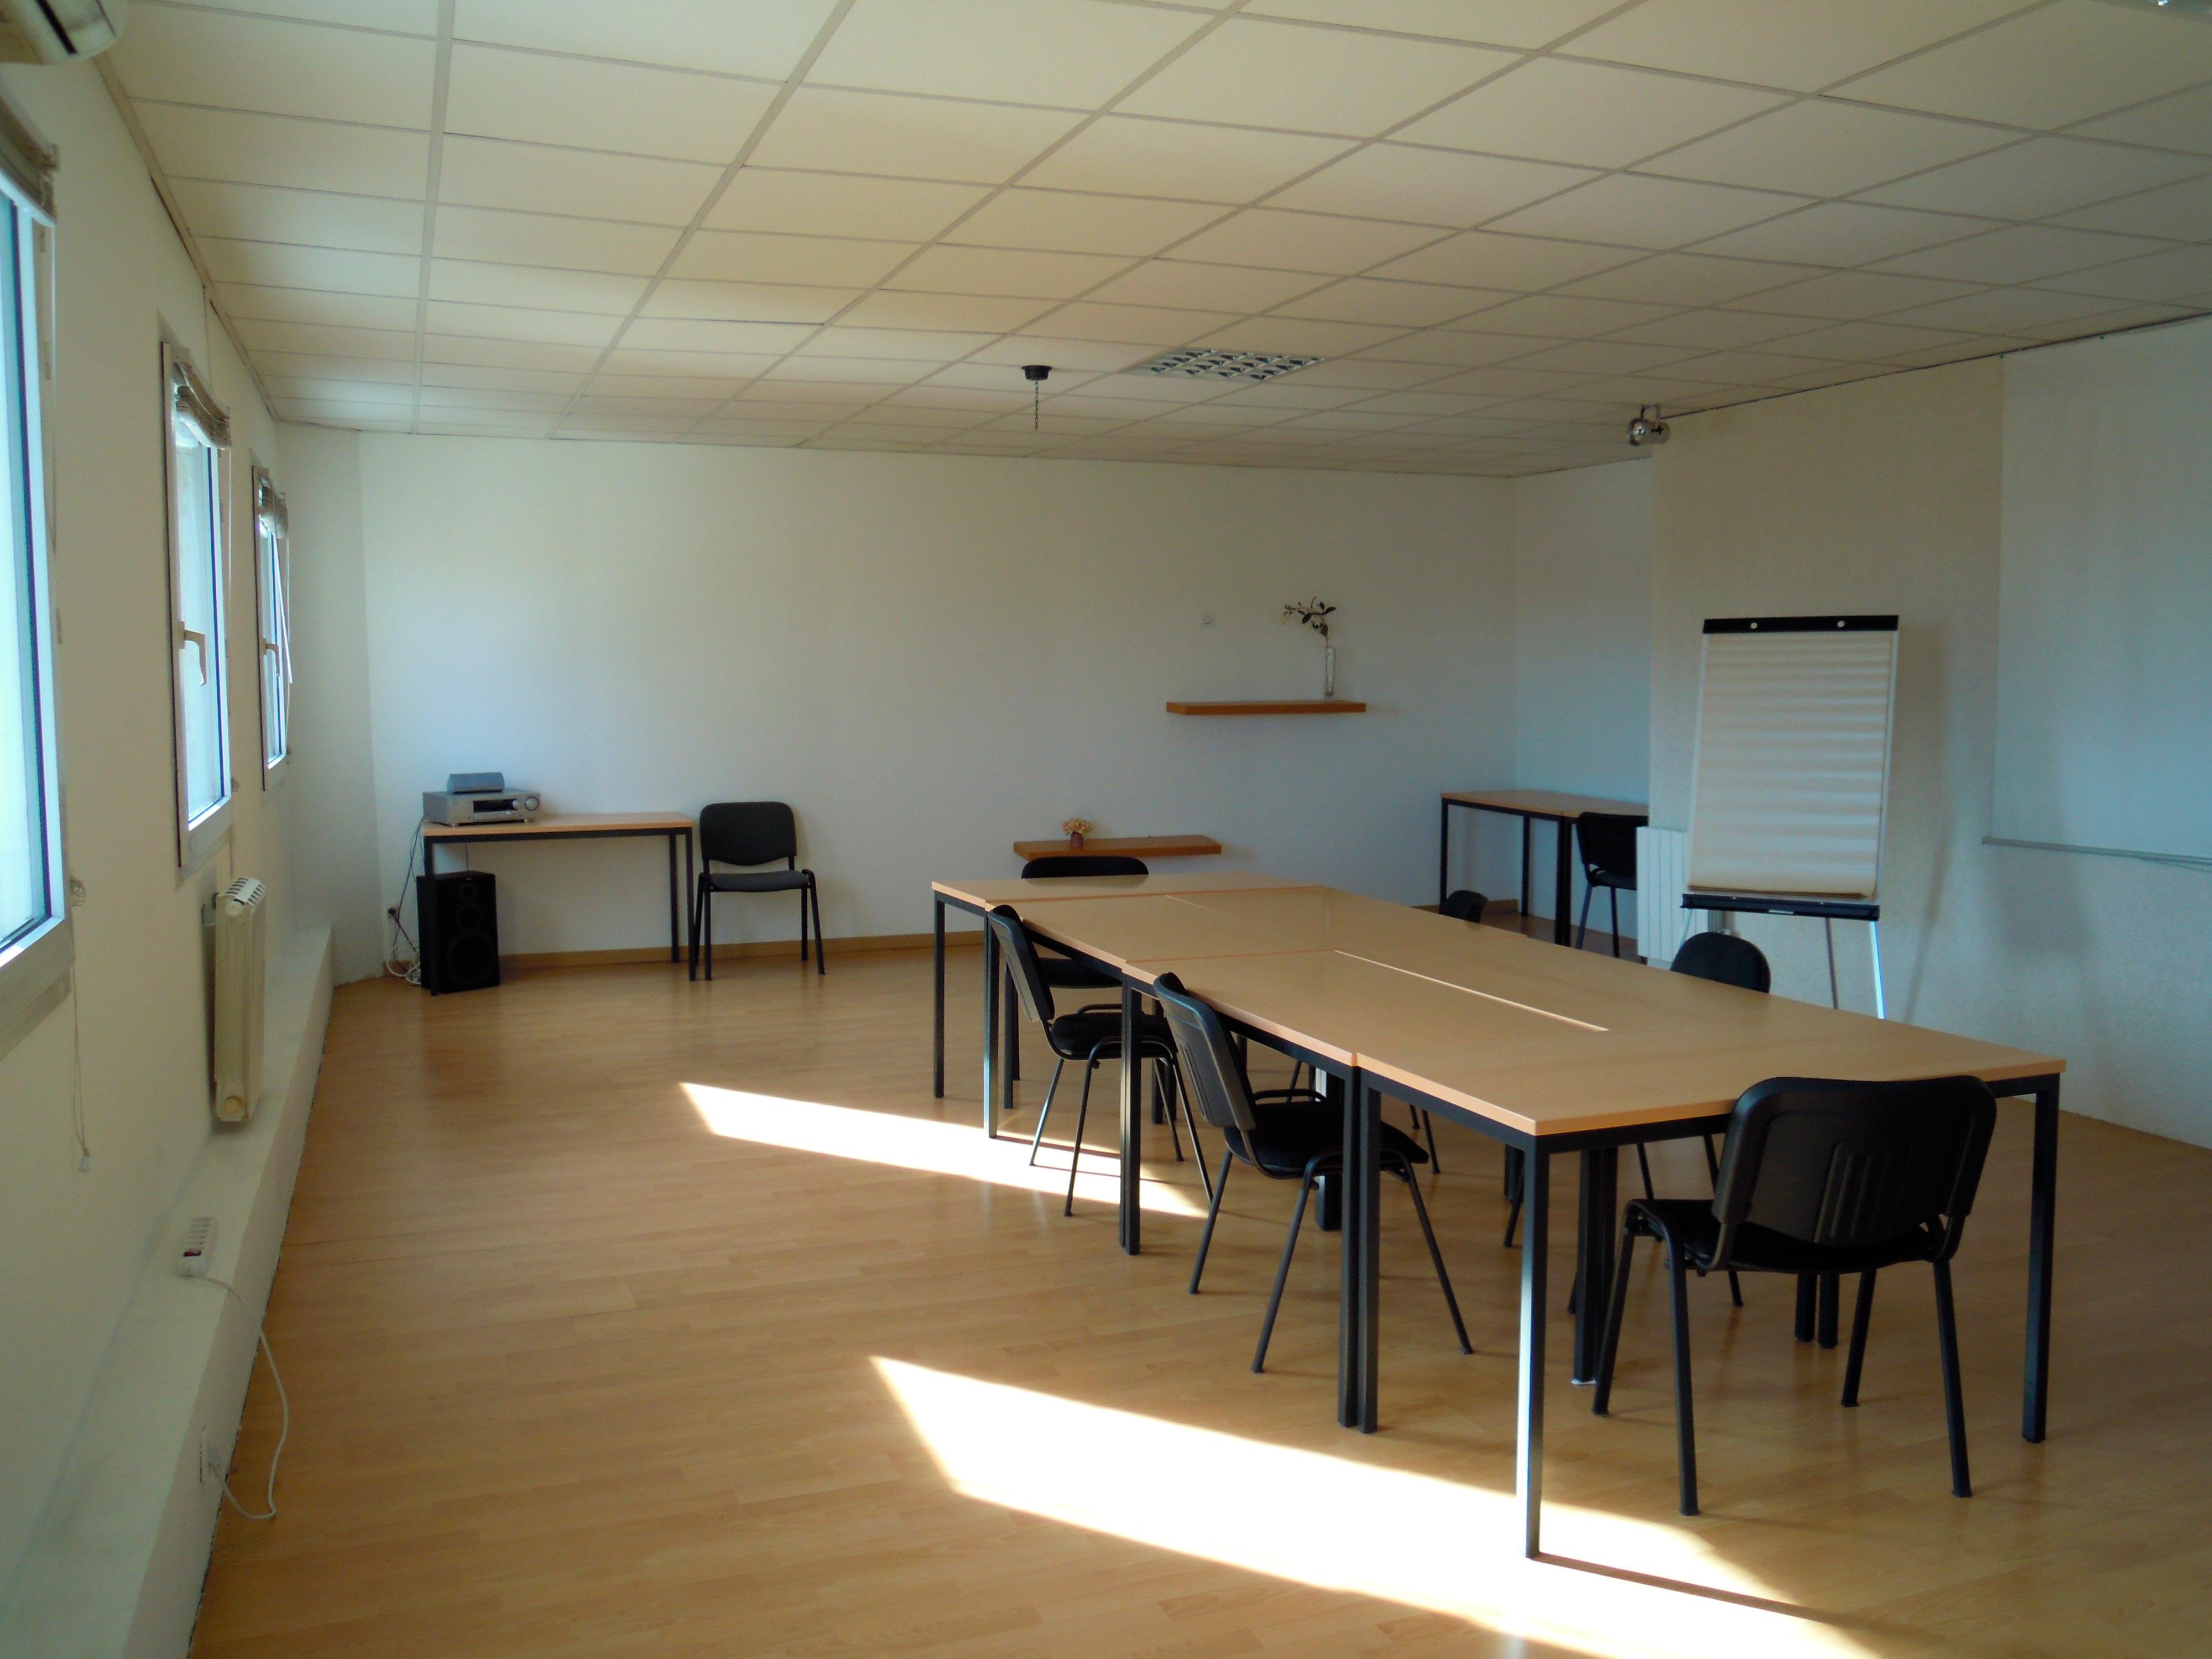 Salle Ikebana 1 modif - Location de salles de réunion